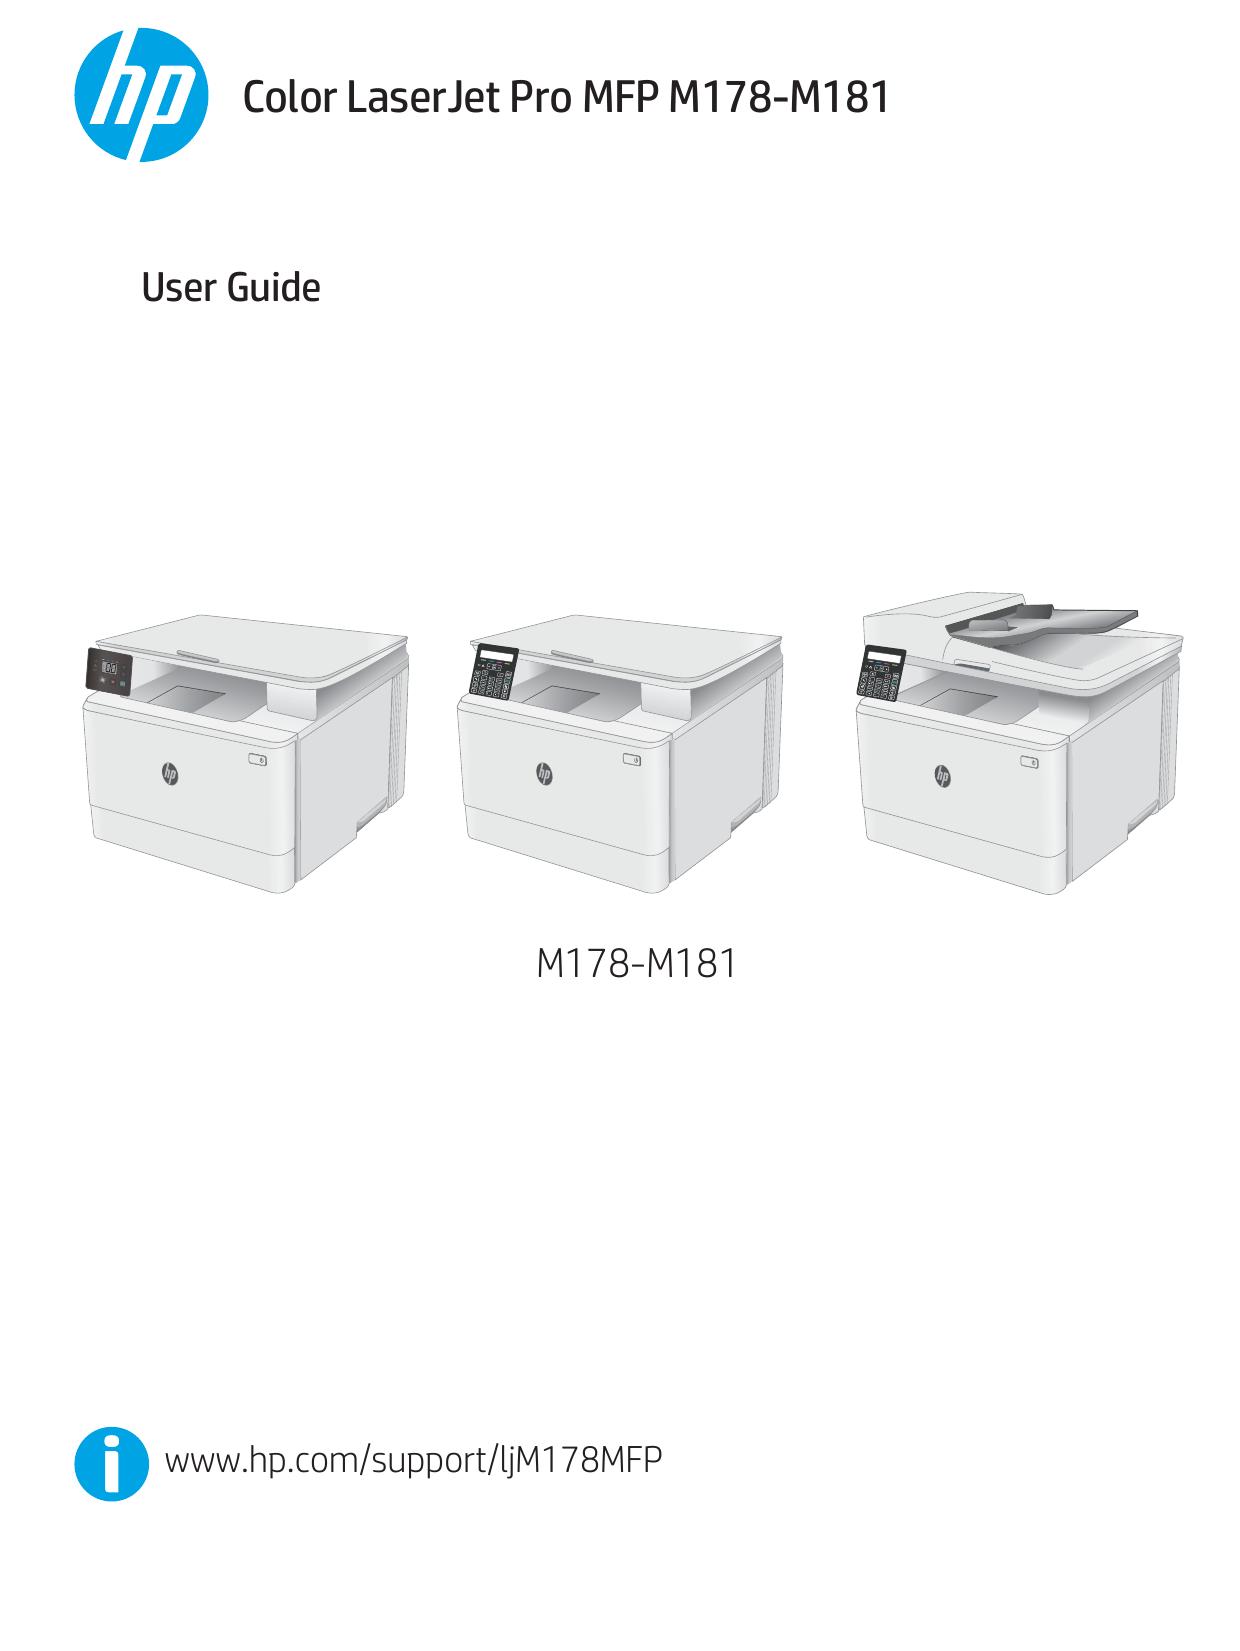 HP Color LaserJet Pro MFP M178-M181 User Guide   manualzz com